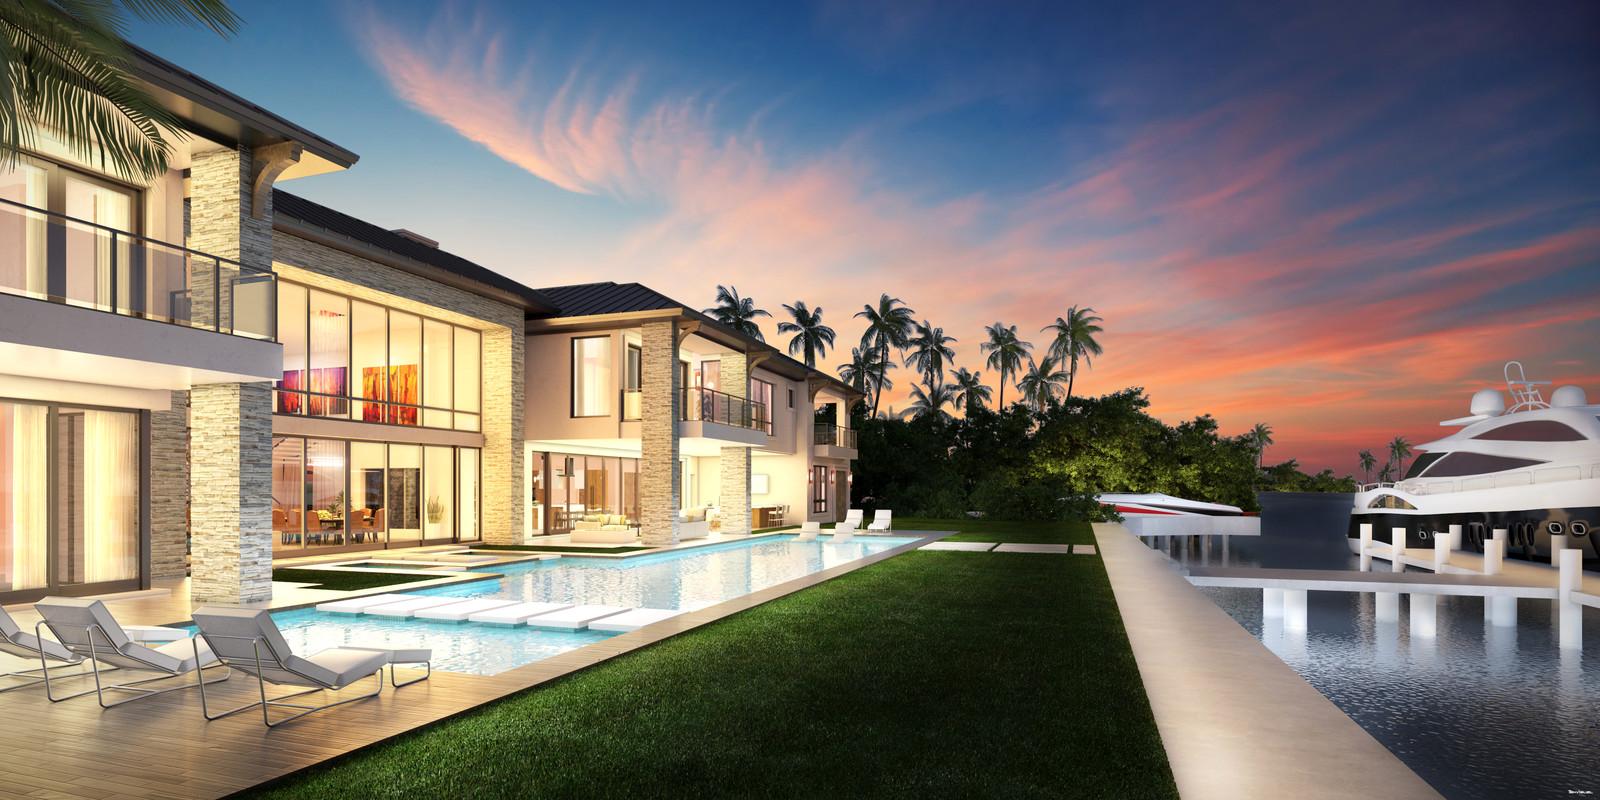 South Floridan Home